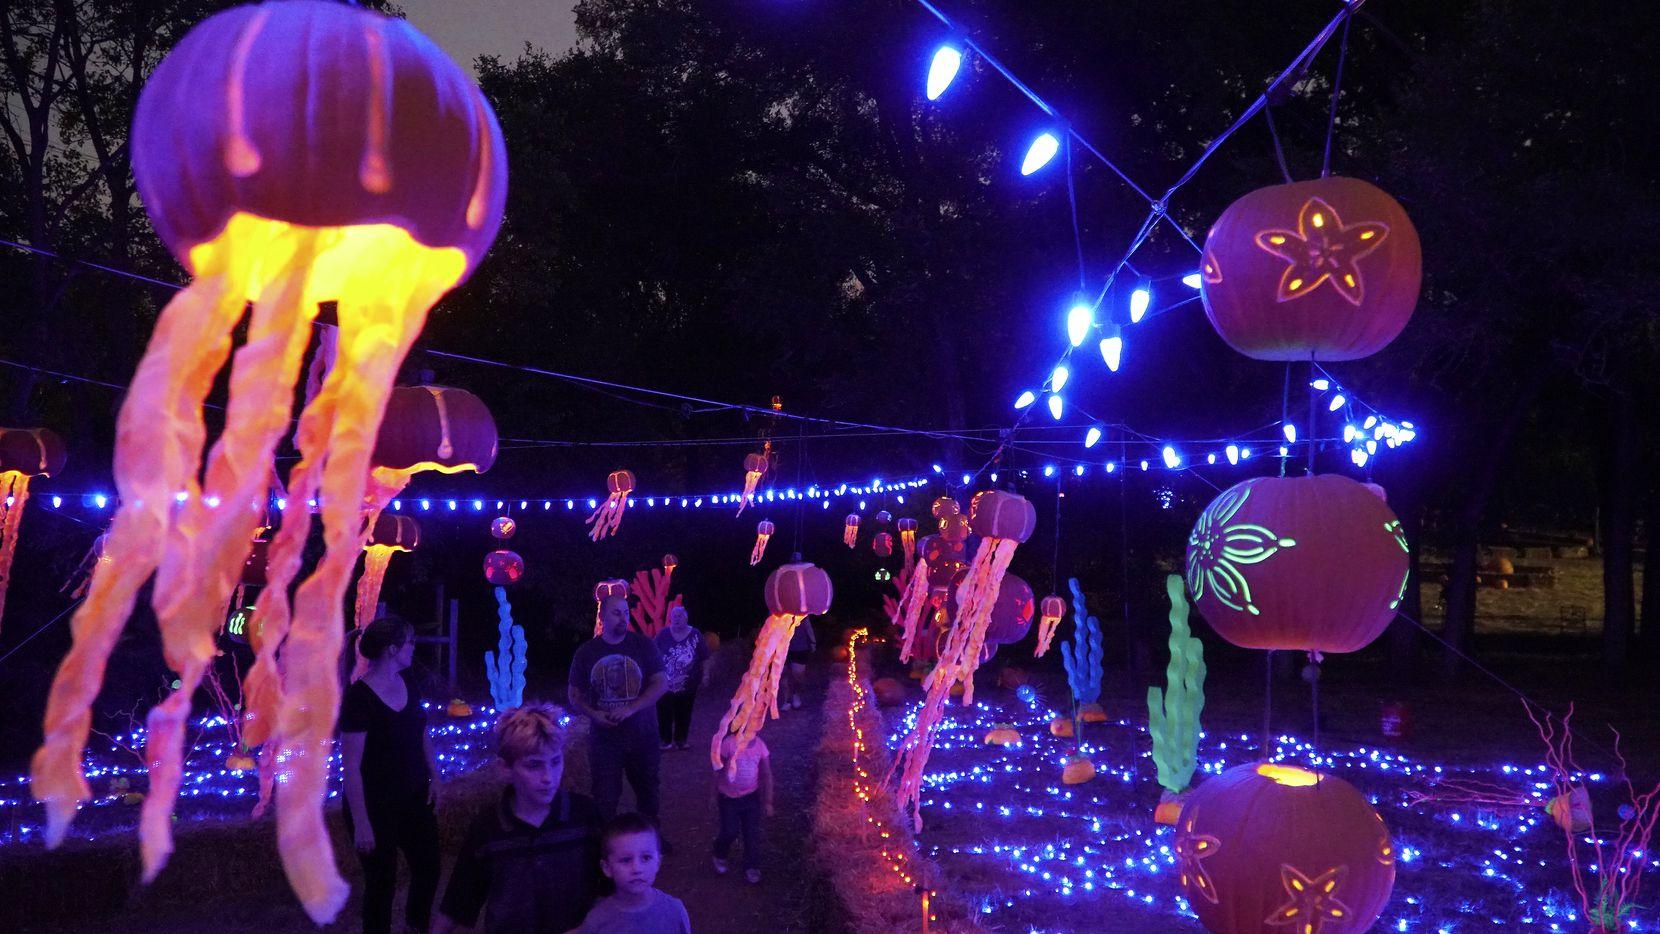 pumpkin nights in arlington is about